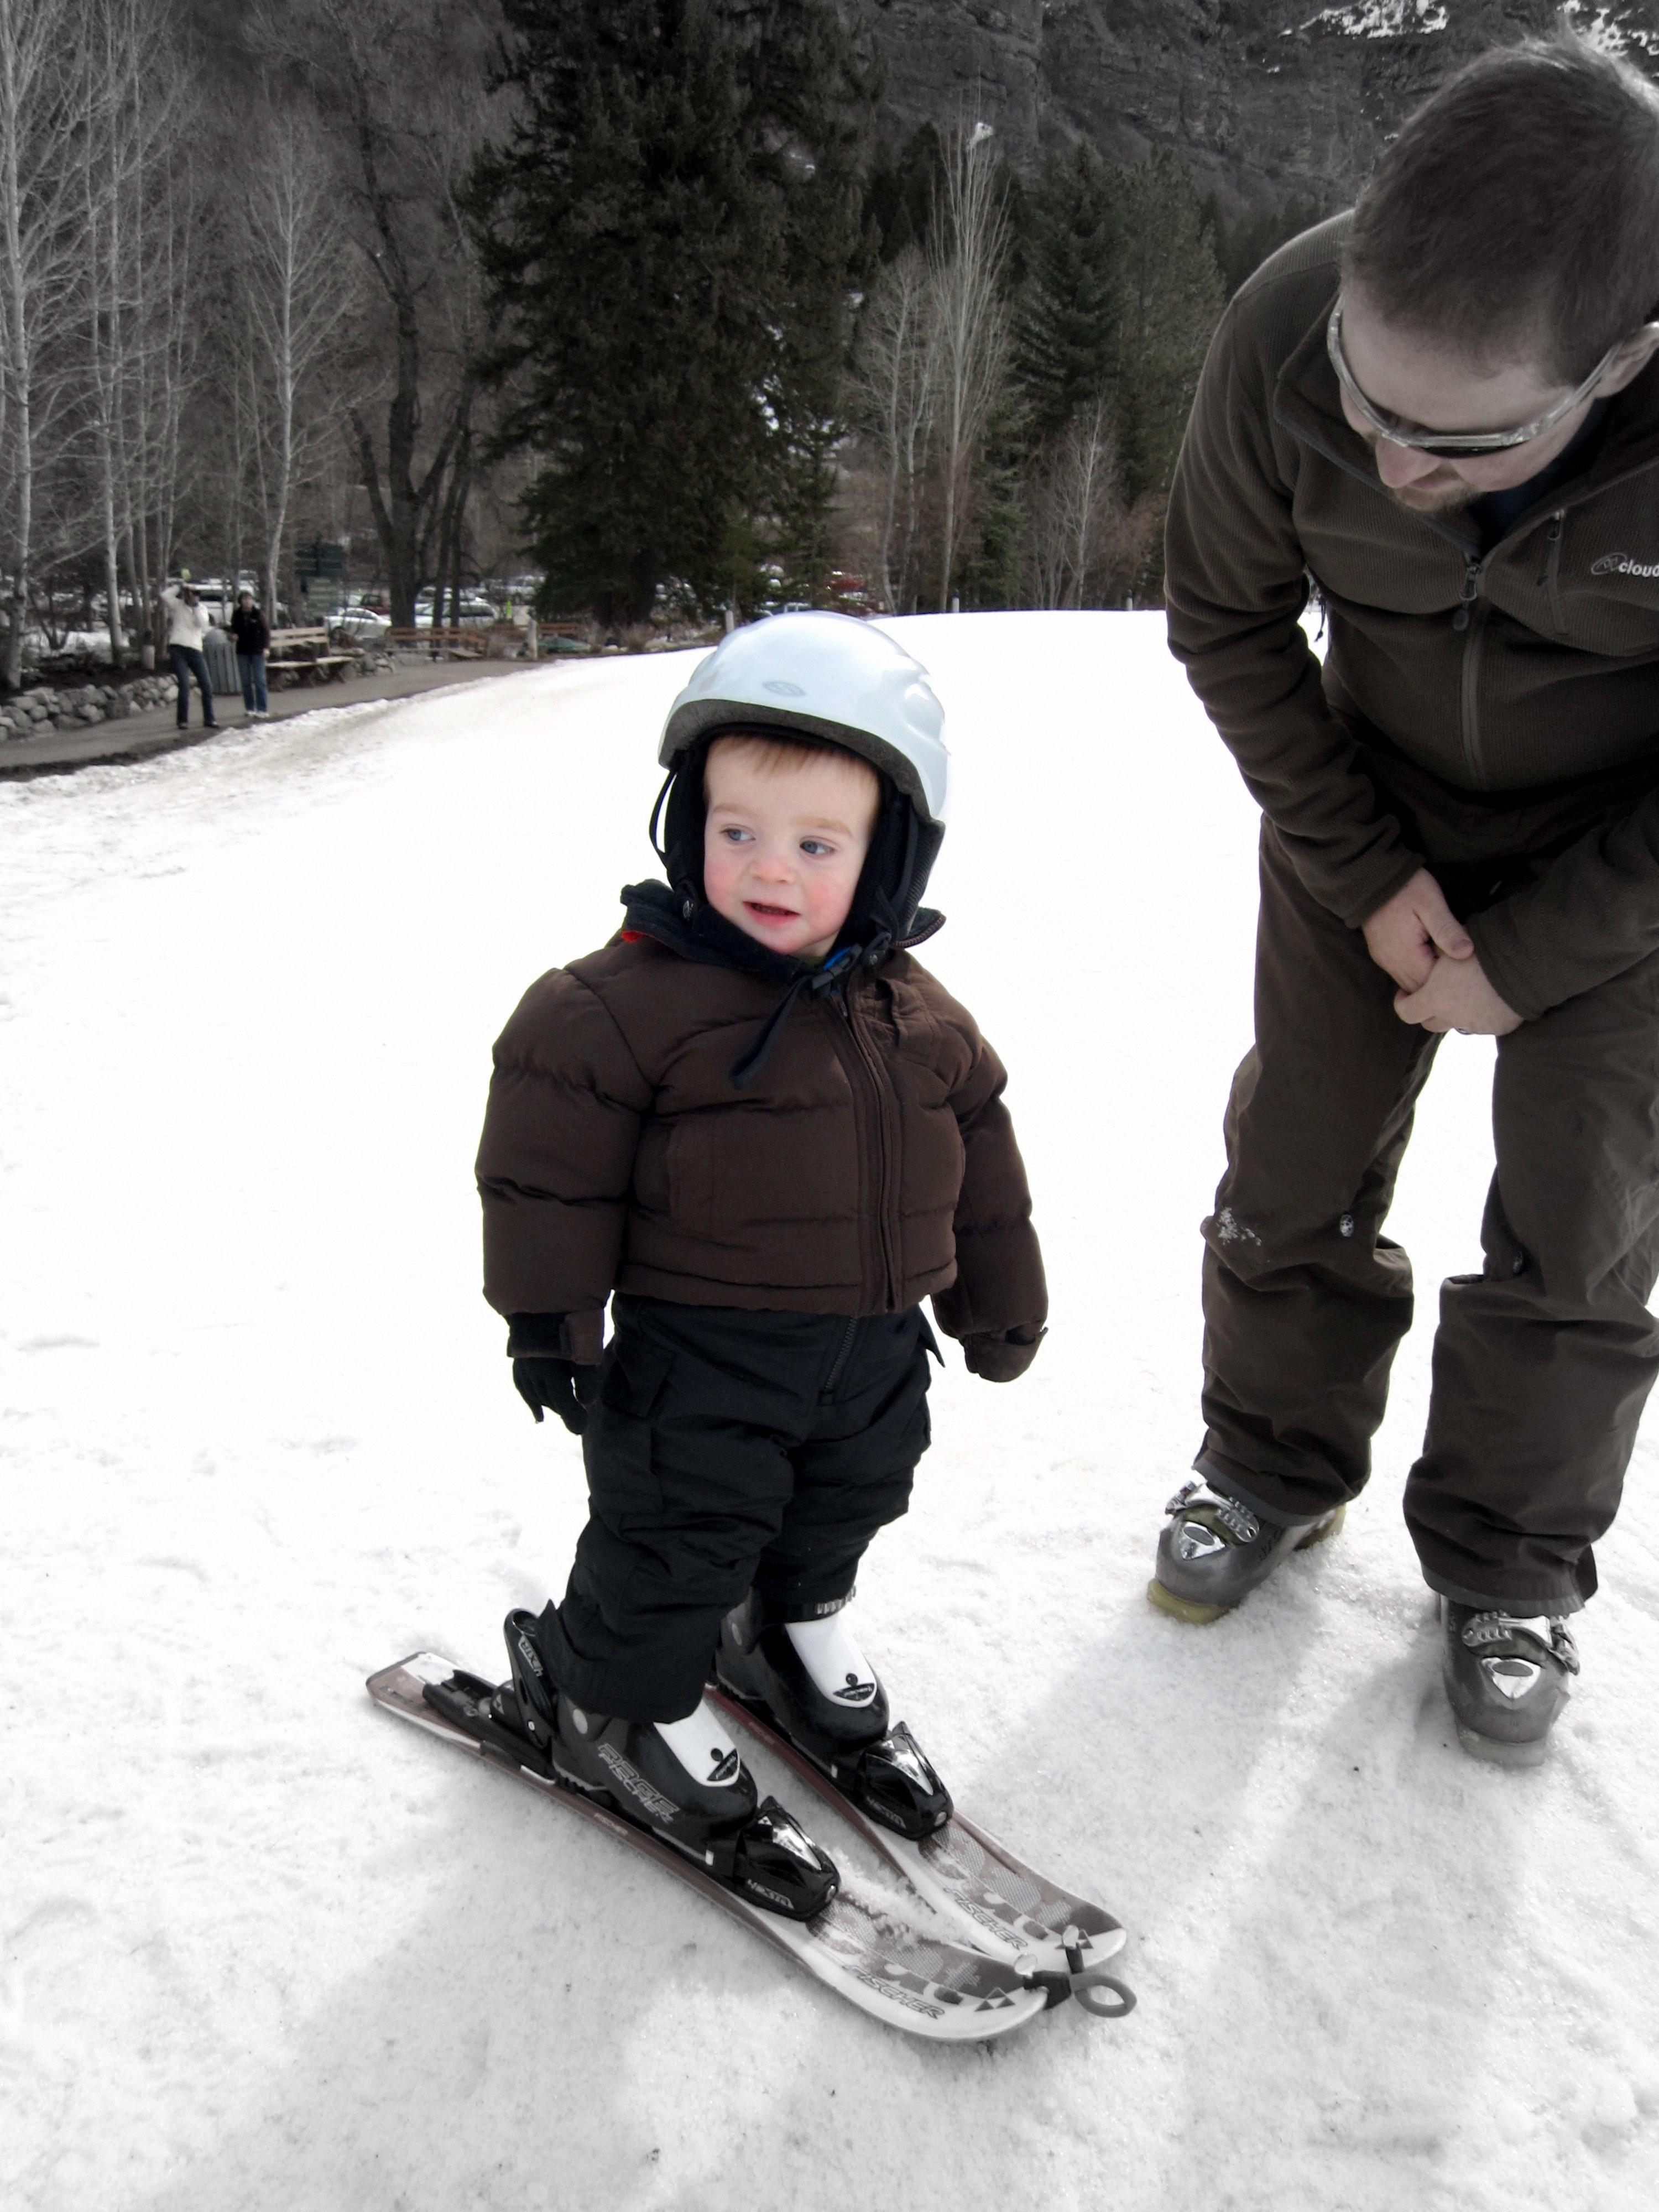 Sol on Skis